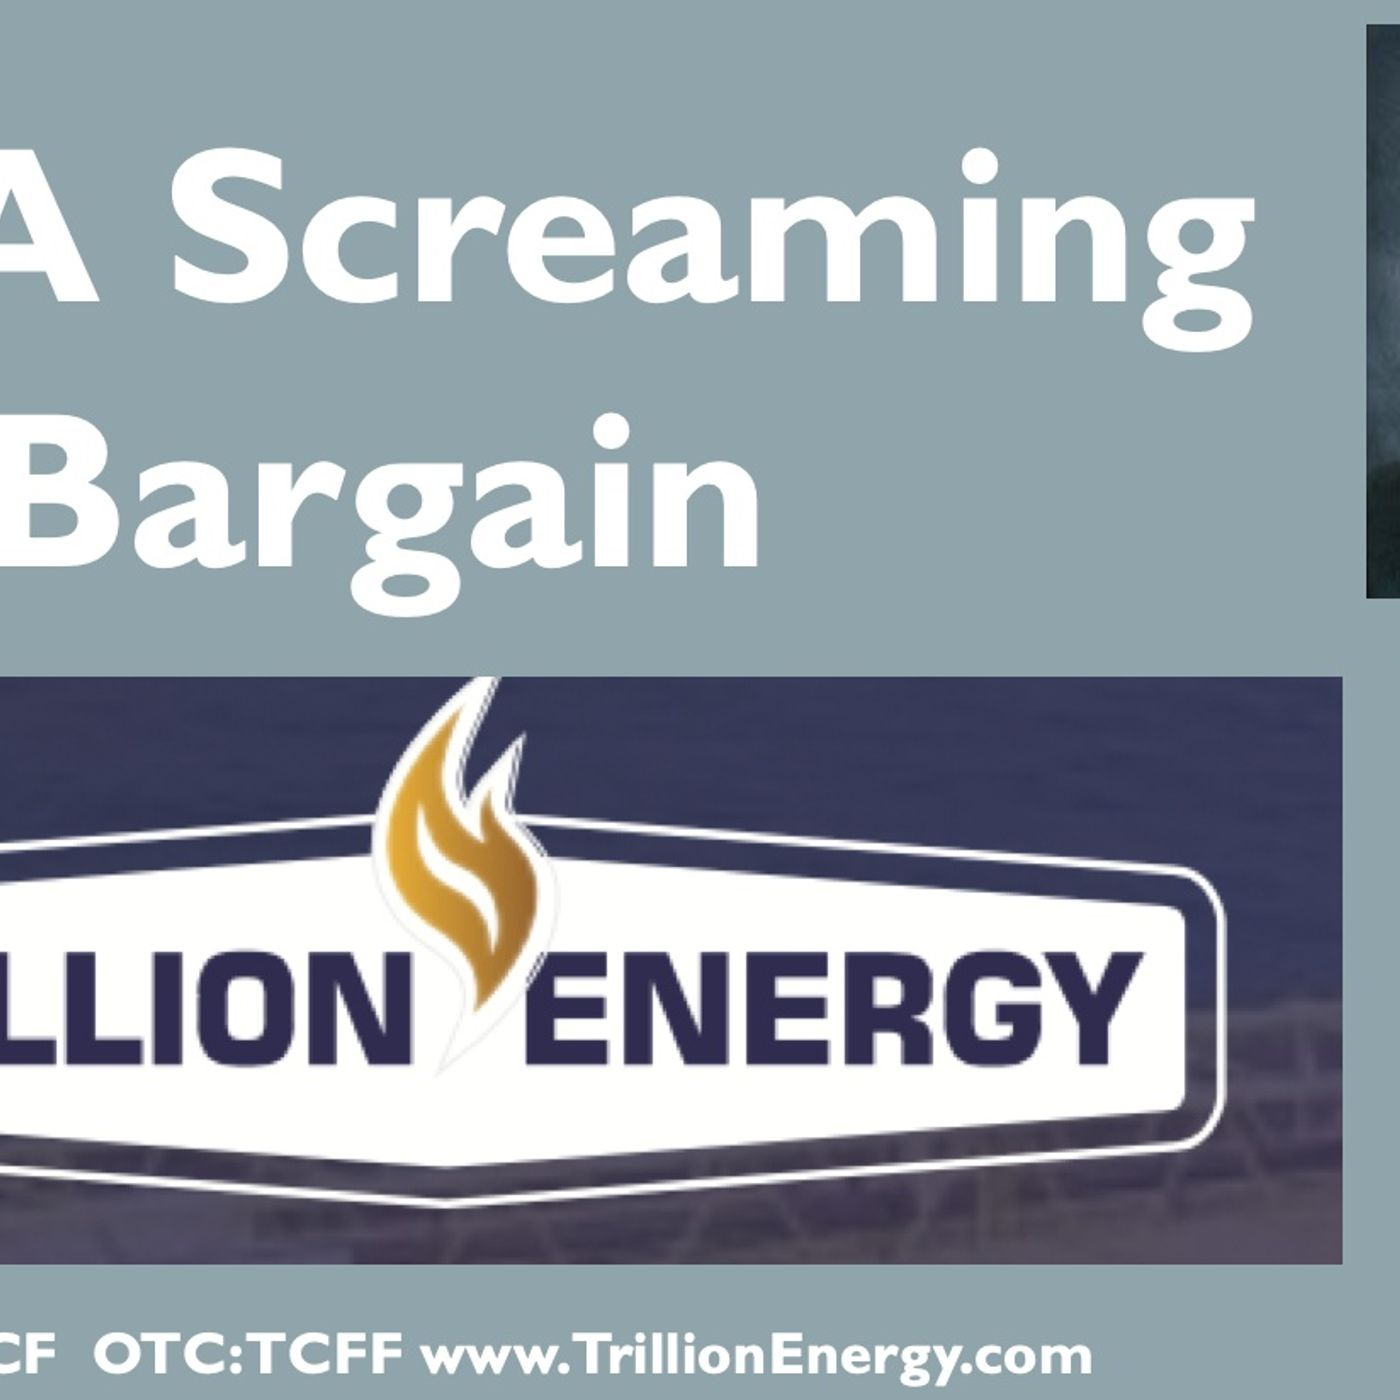 Still A Screaming Bargain - Trillion Energy